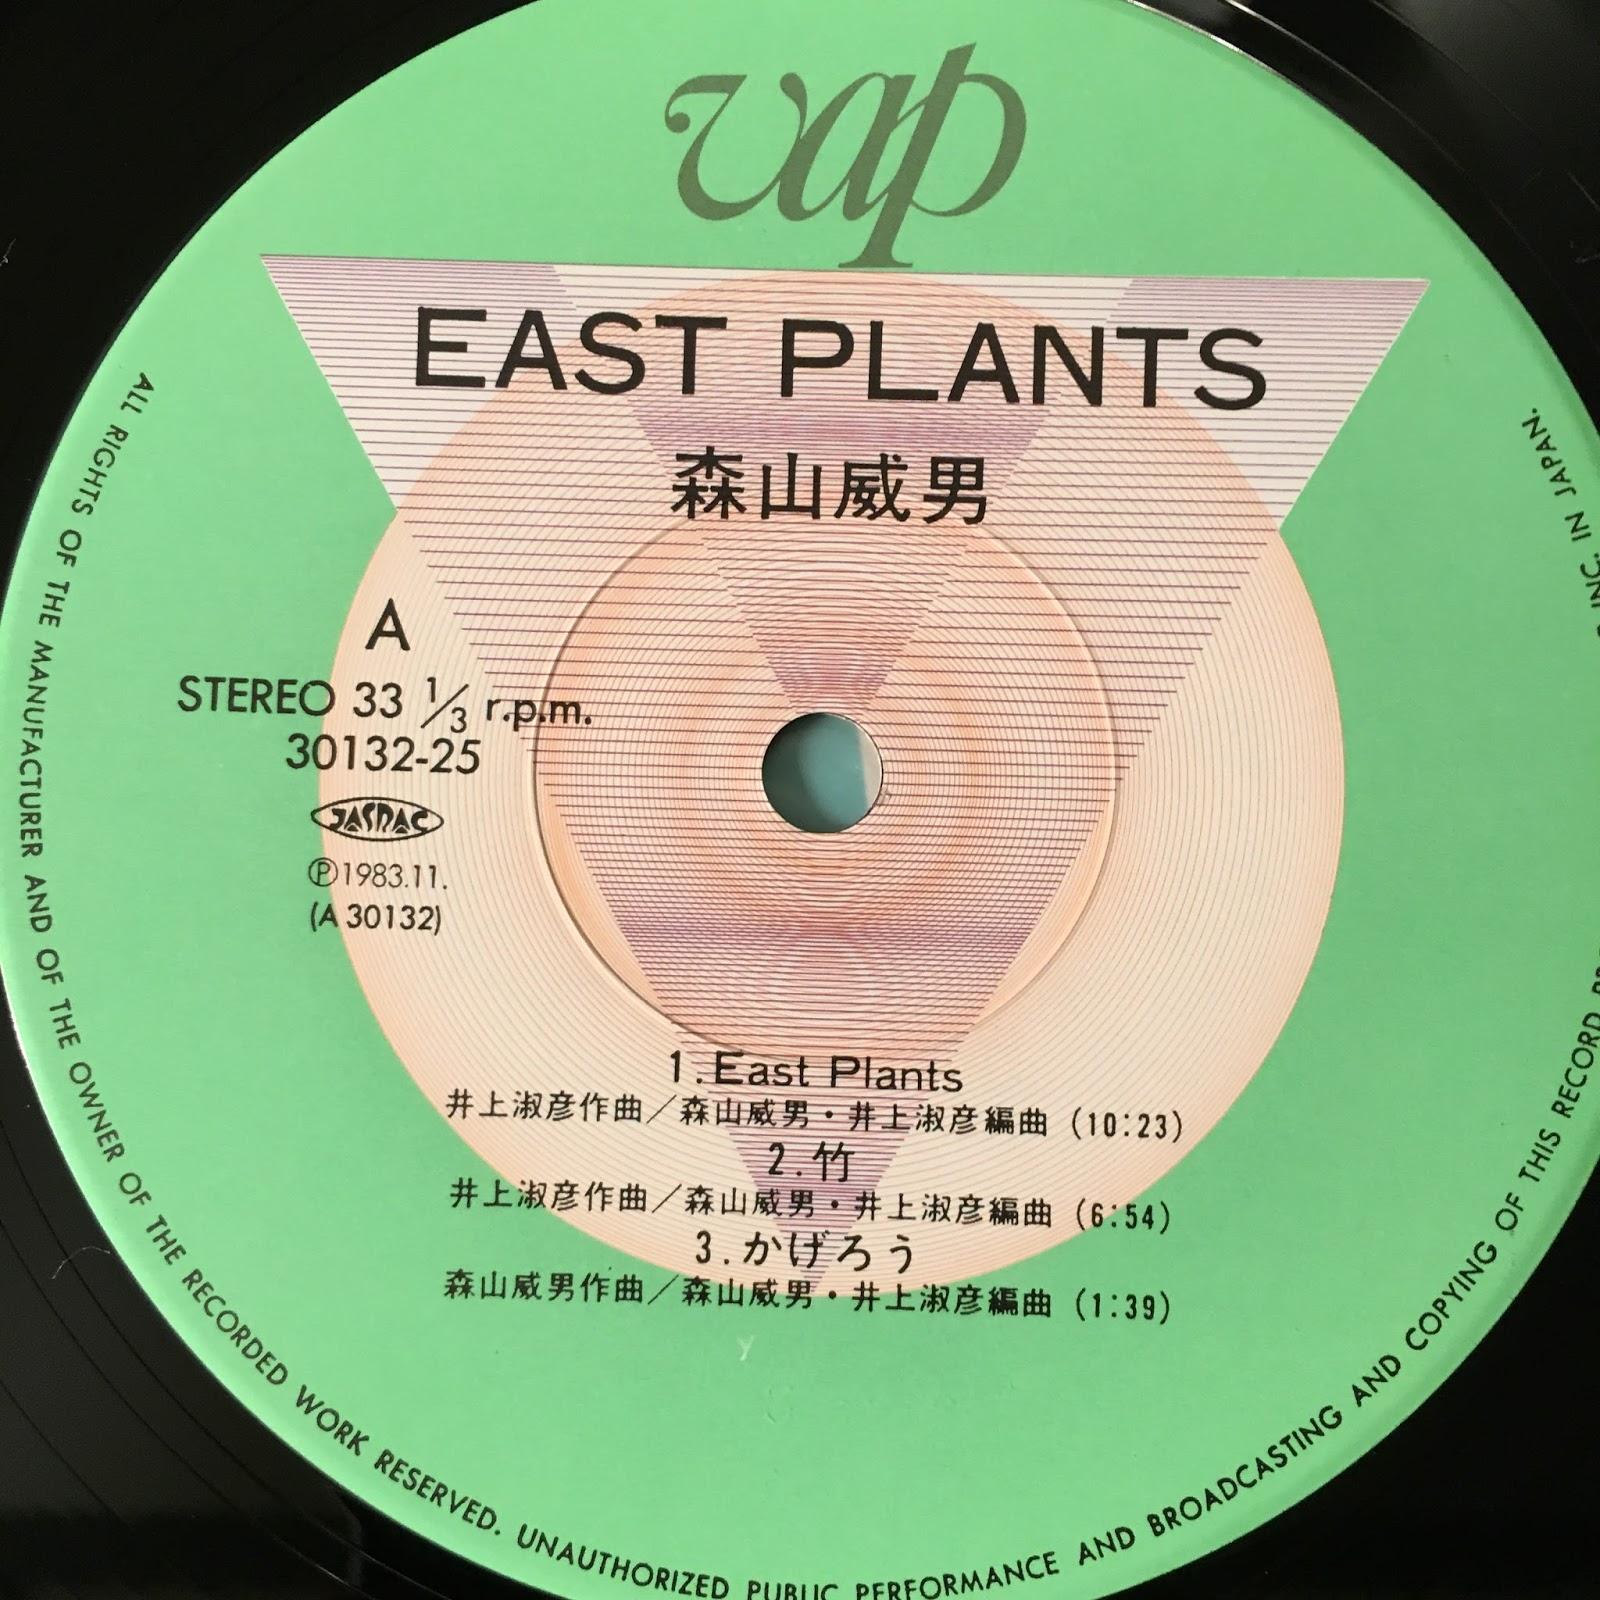 endless planets: TAKEO MORIYAMA - East Plants (VAP, 1983)